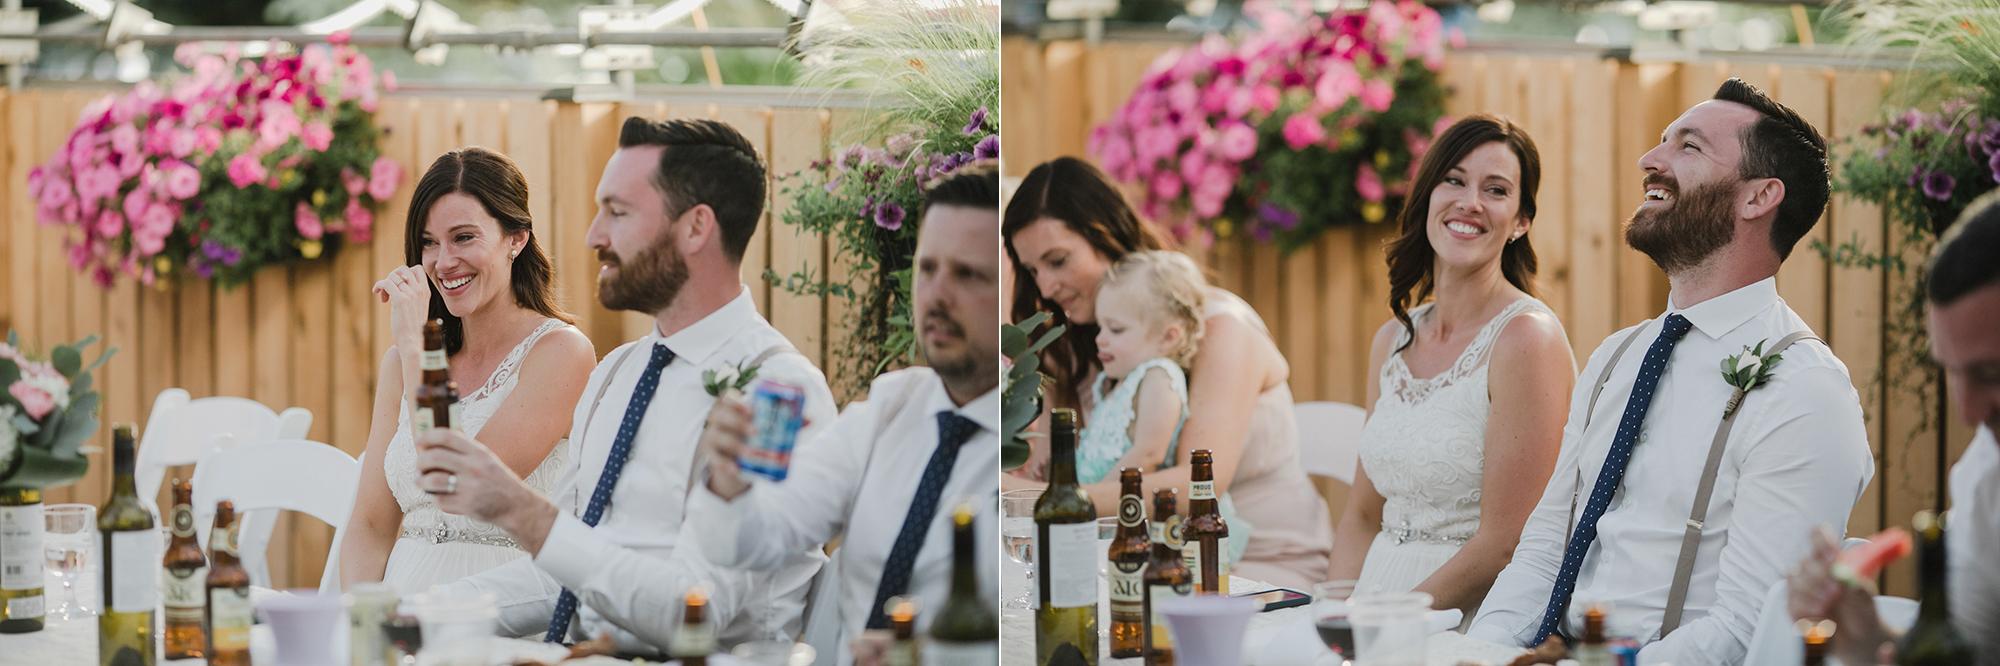 Flower Farm Crowsnest Pass Wedding -116.JPG